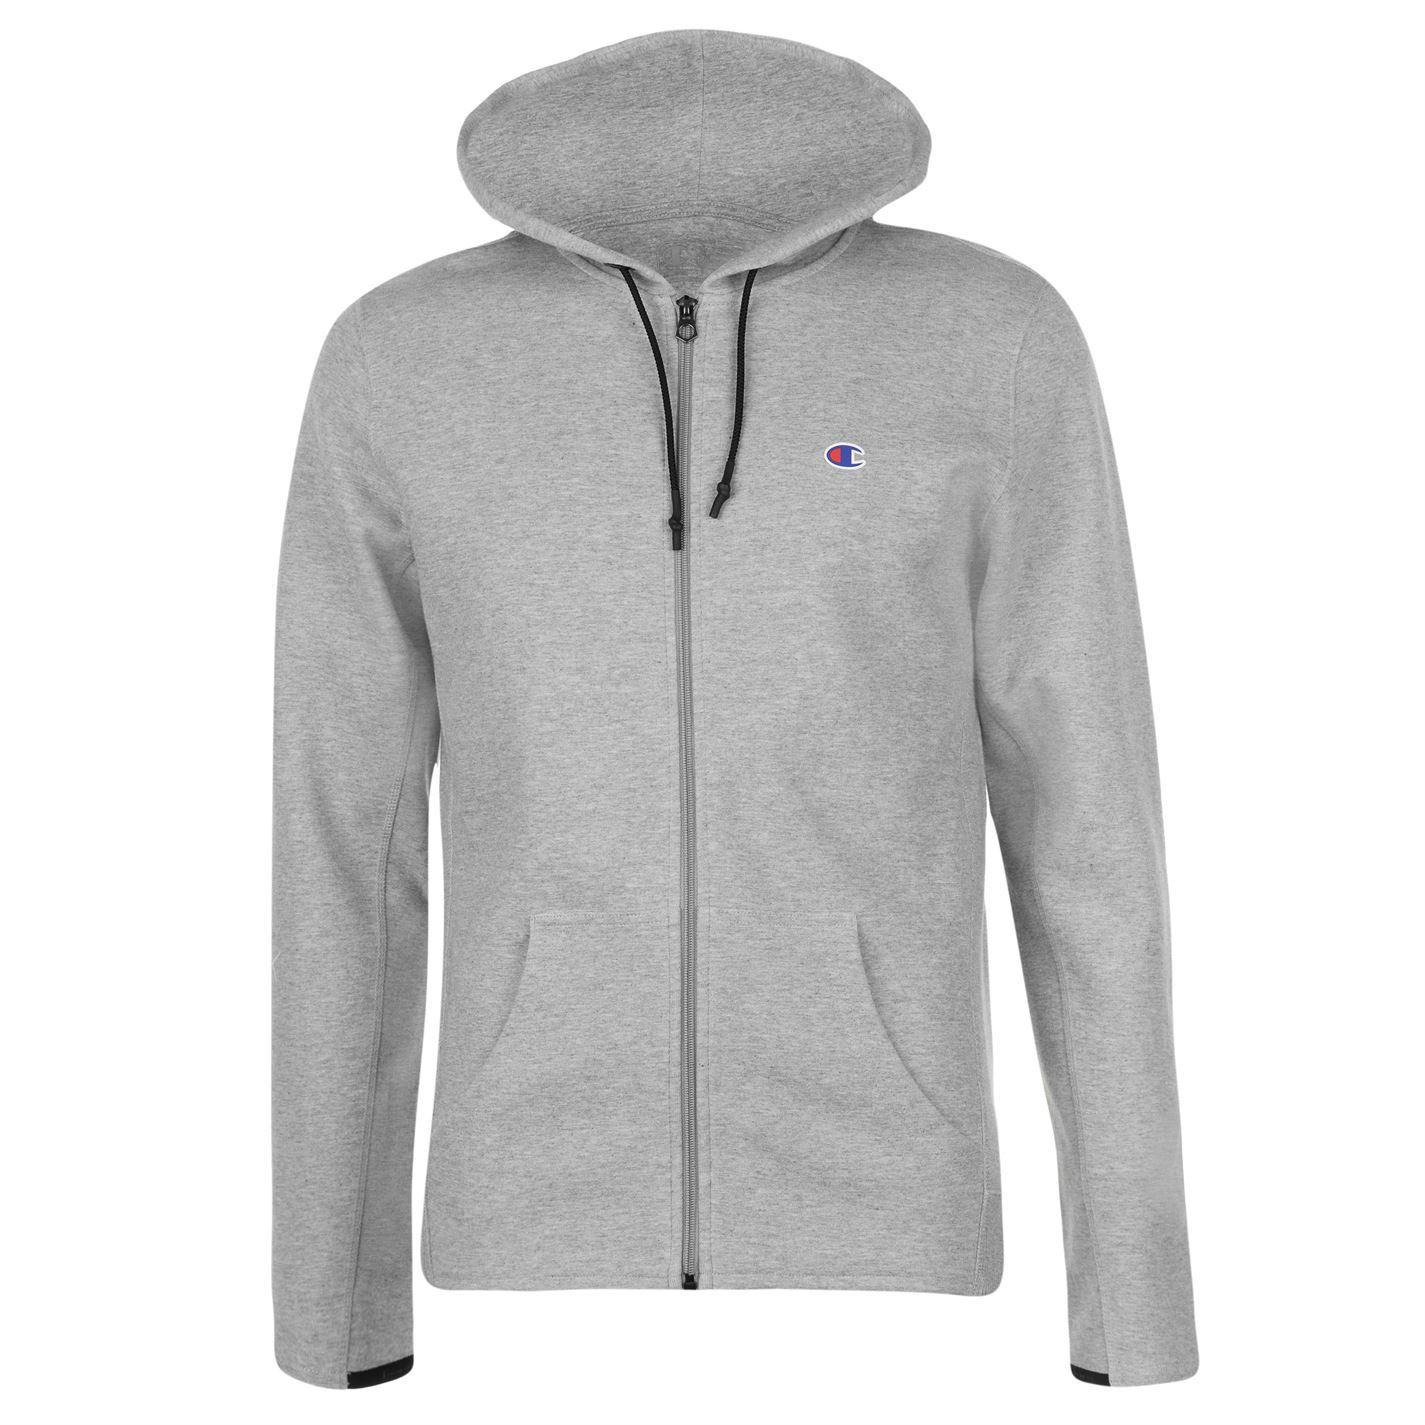 Champion-Interlock-Full-Zip-Hoody-Mens-Hoodie-Top-Sweatshirt-Sweater thumbnail 10